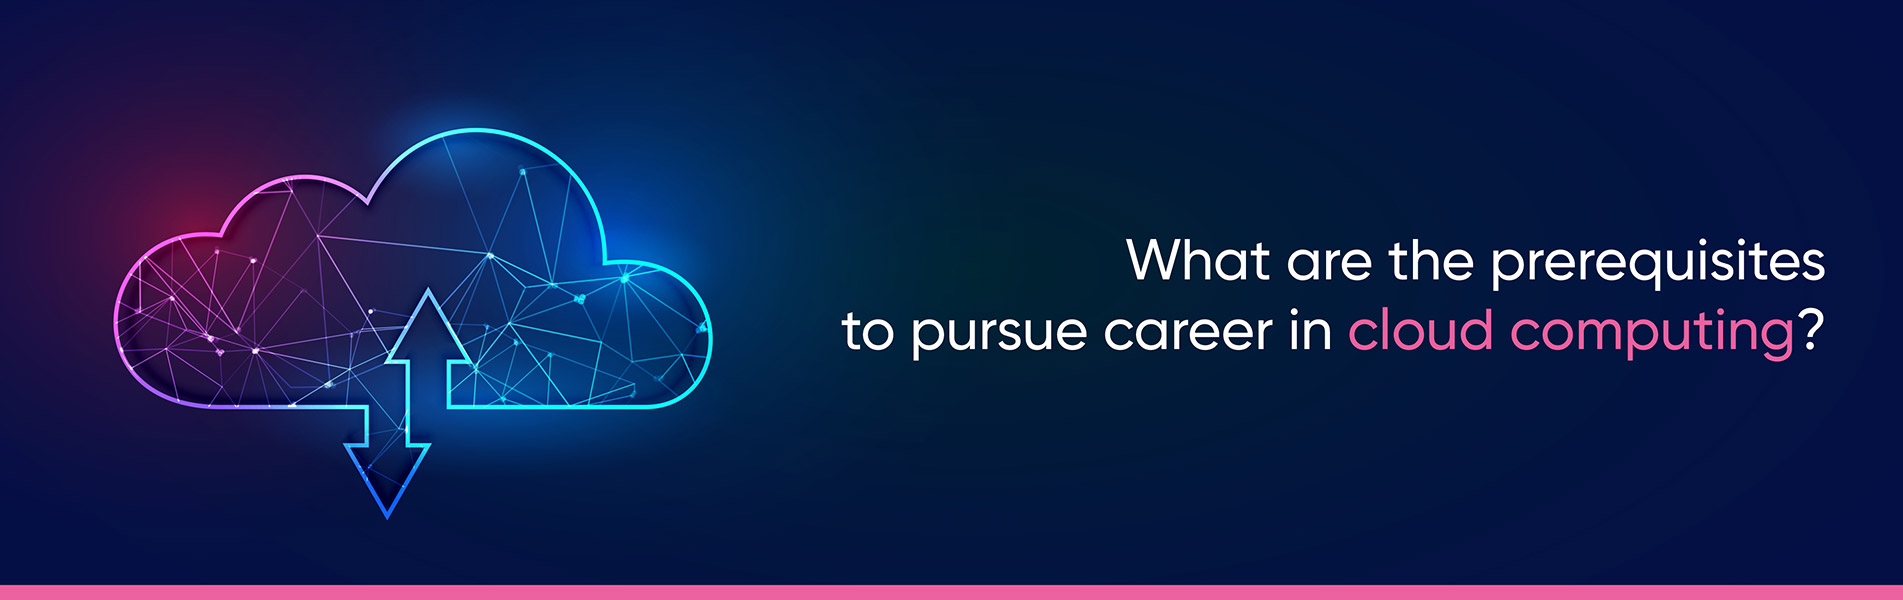 career, cloud computing